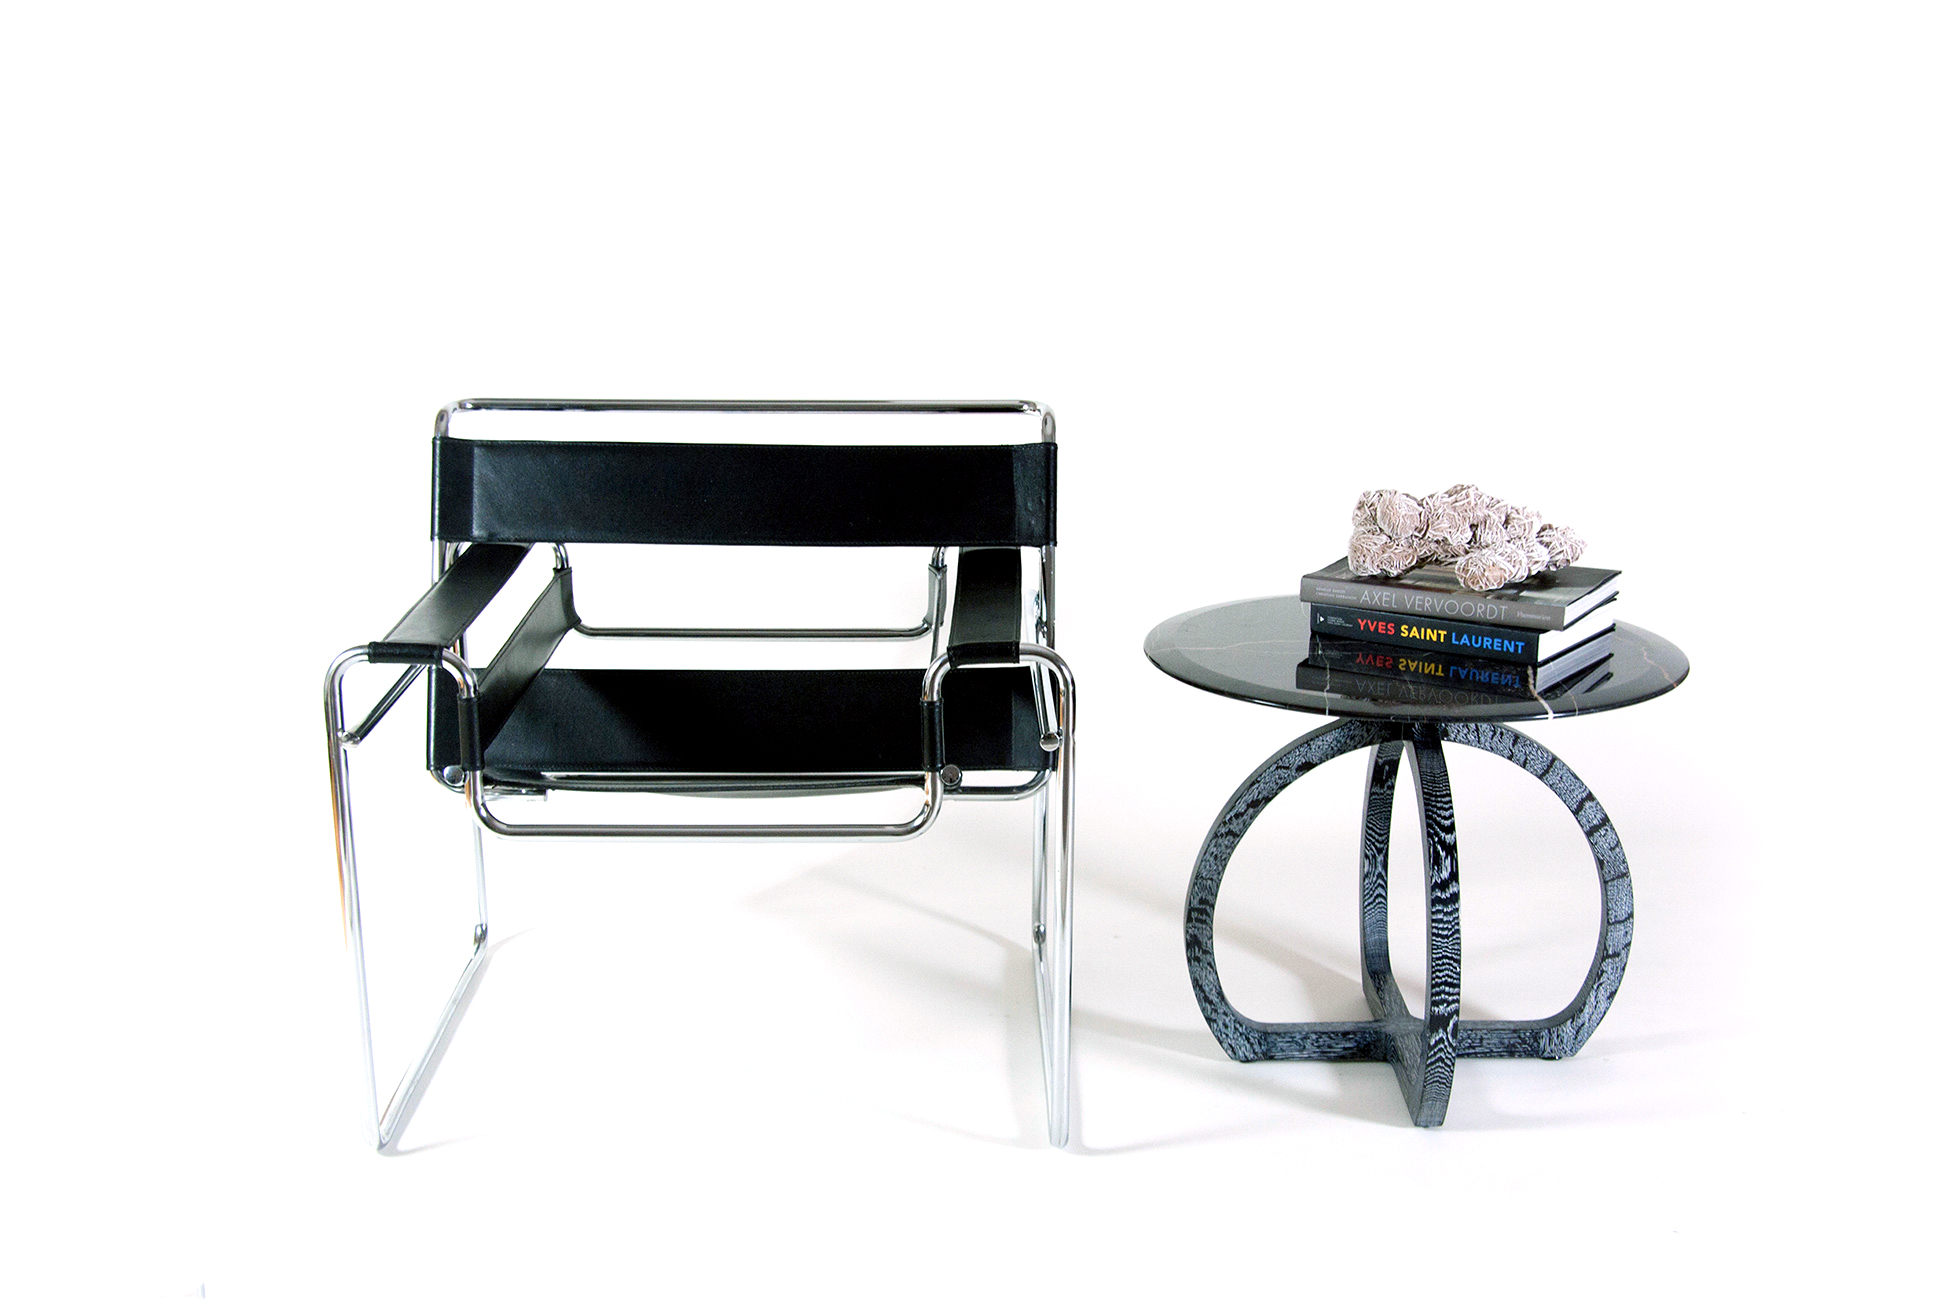 ELLIOT-EAKIN-Furniture---Ceruse-Side-Table---Context-FRONT.jpg